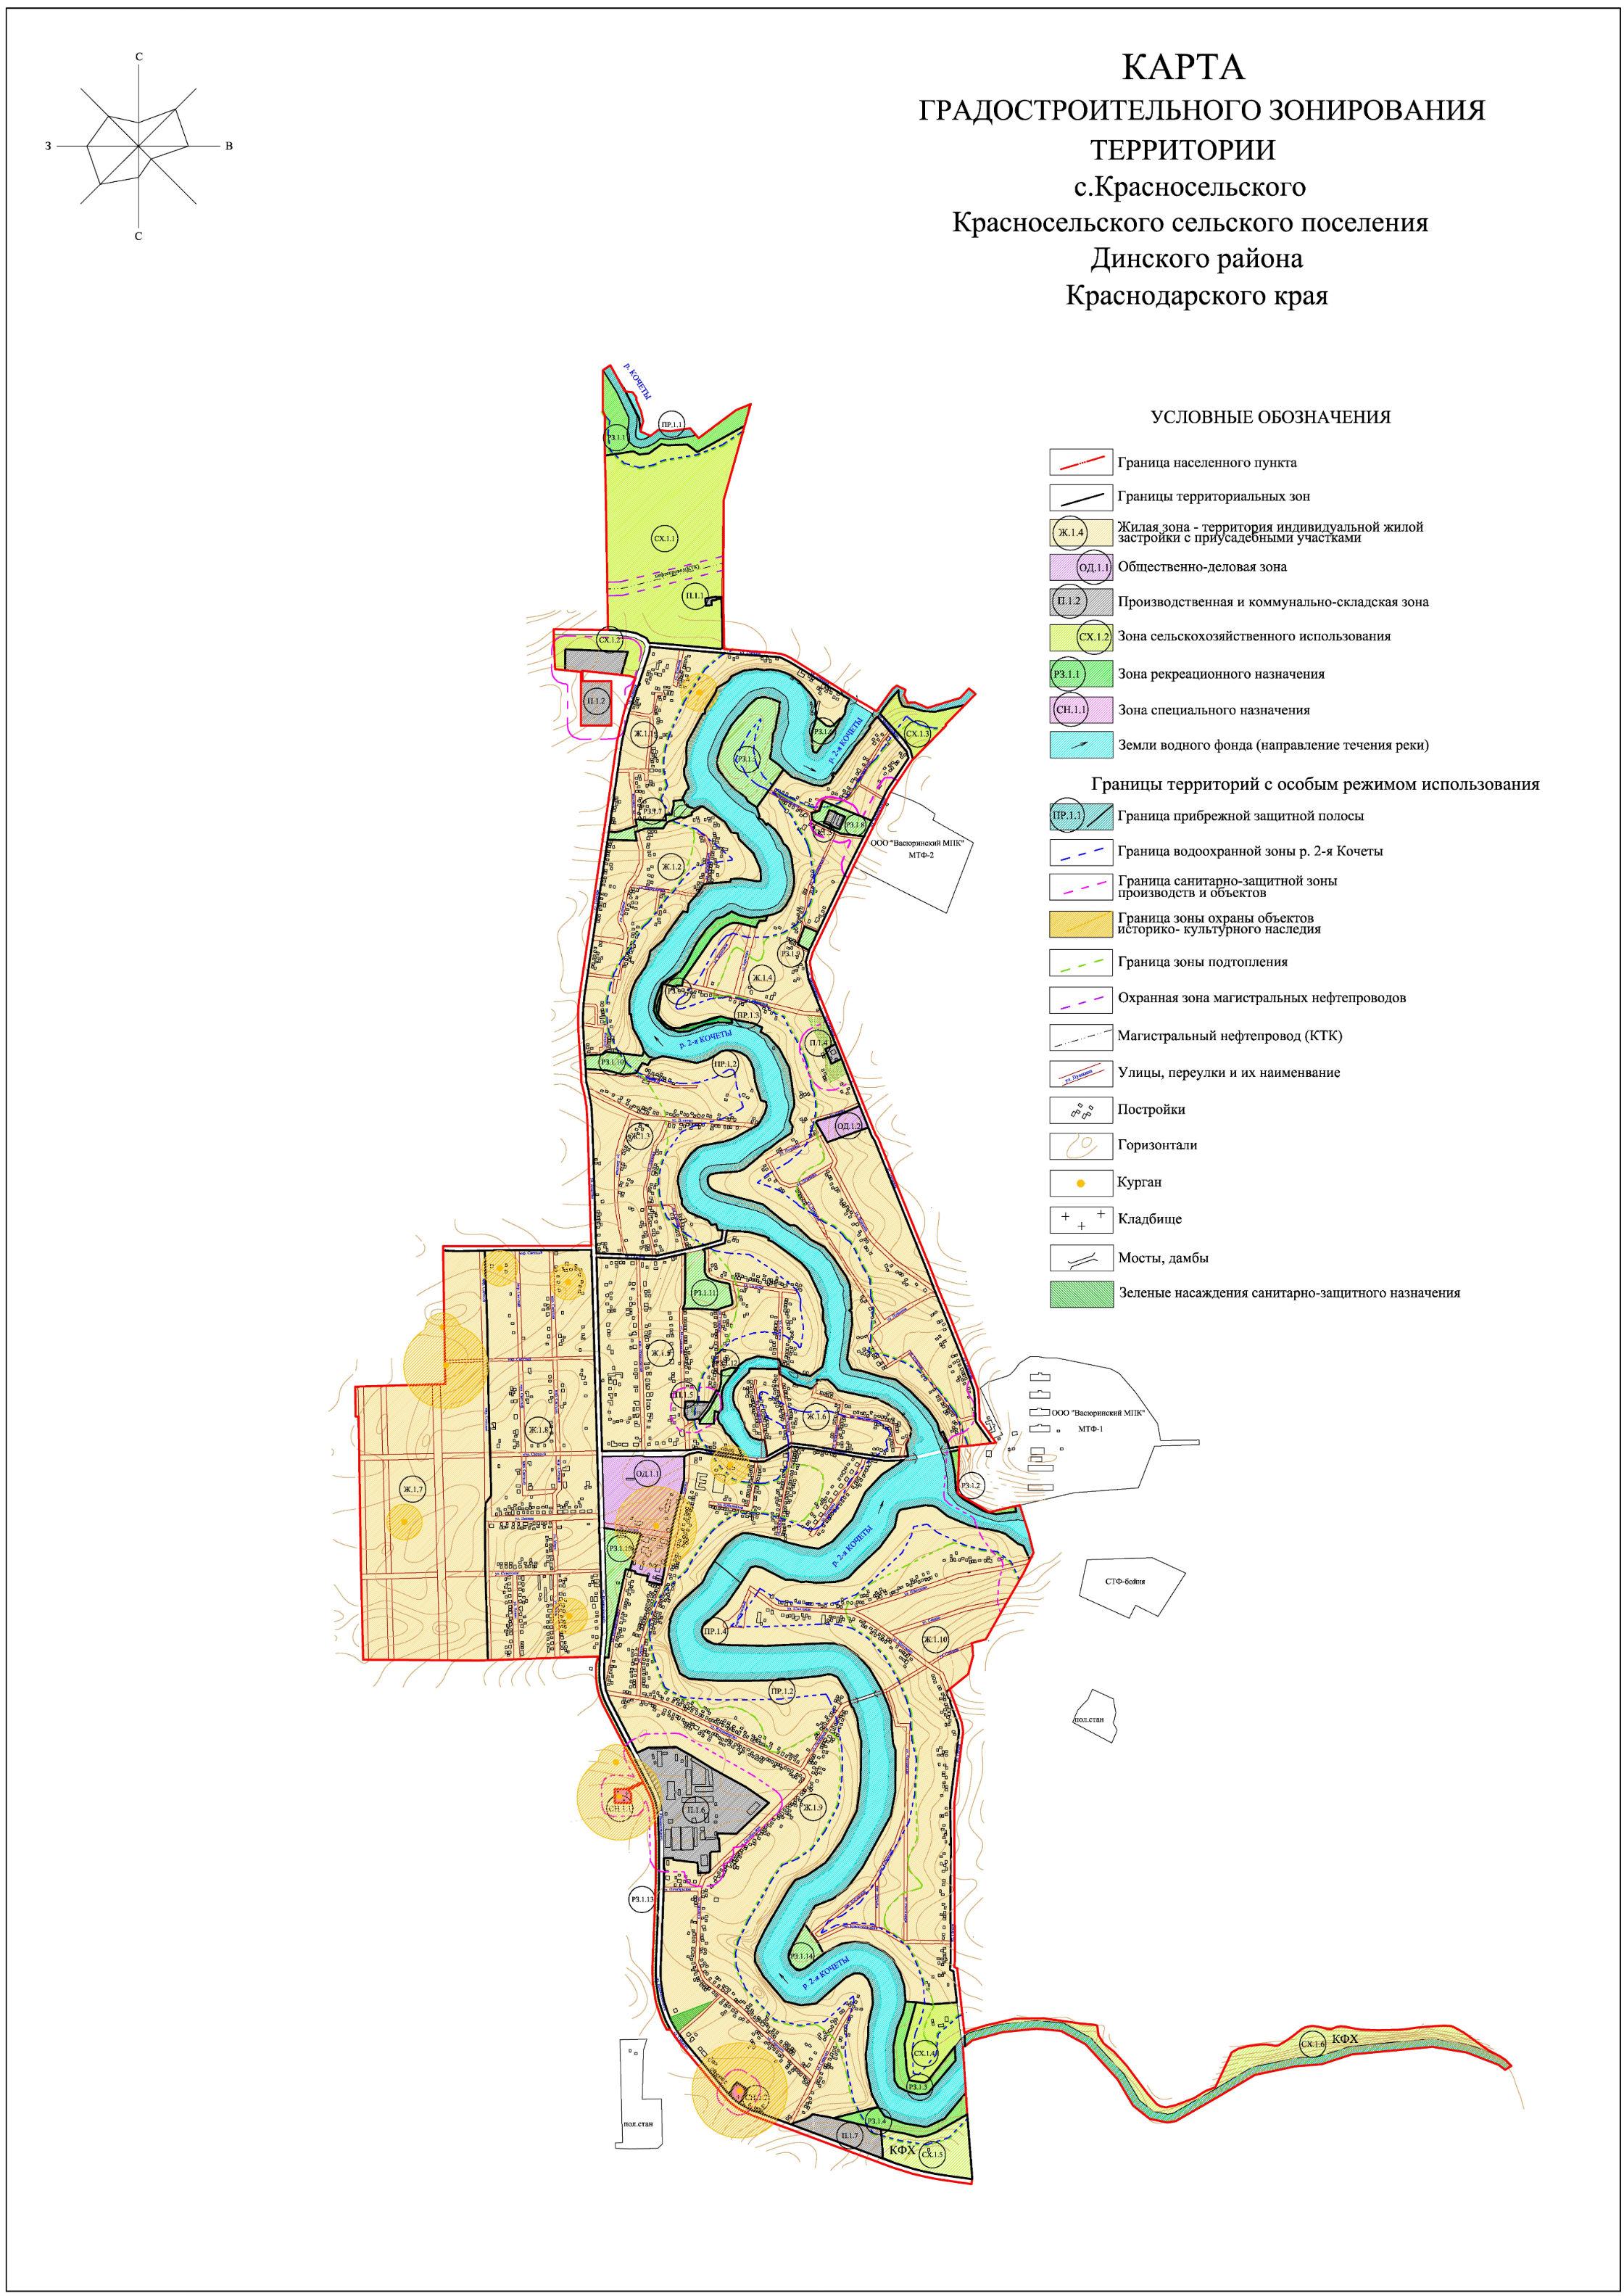 схема каналов краснодарского края